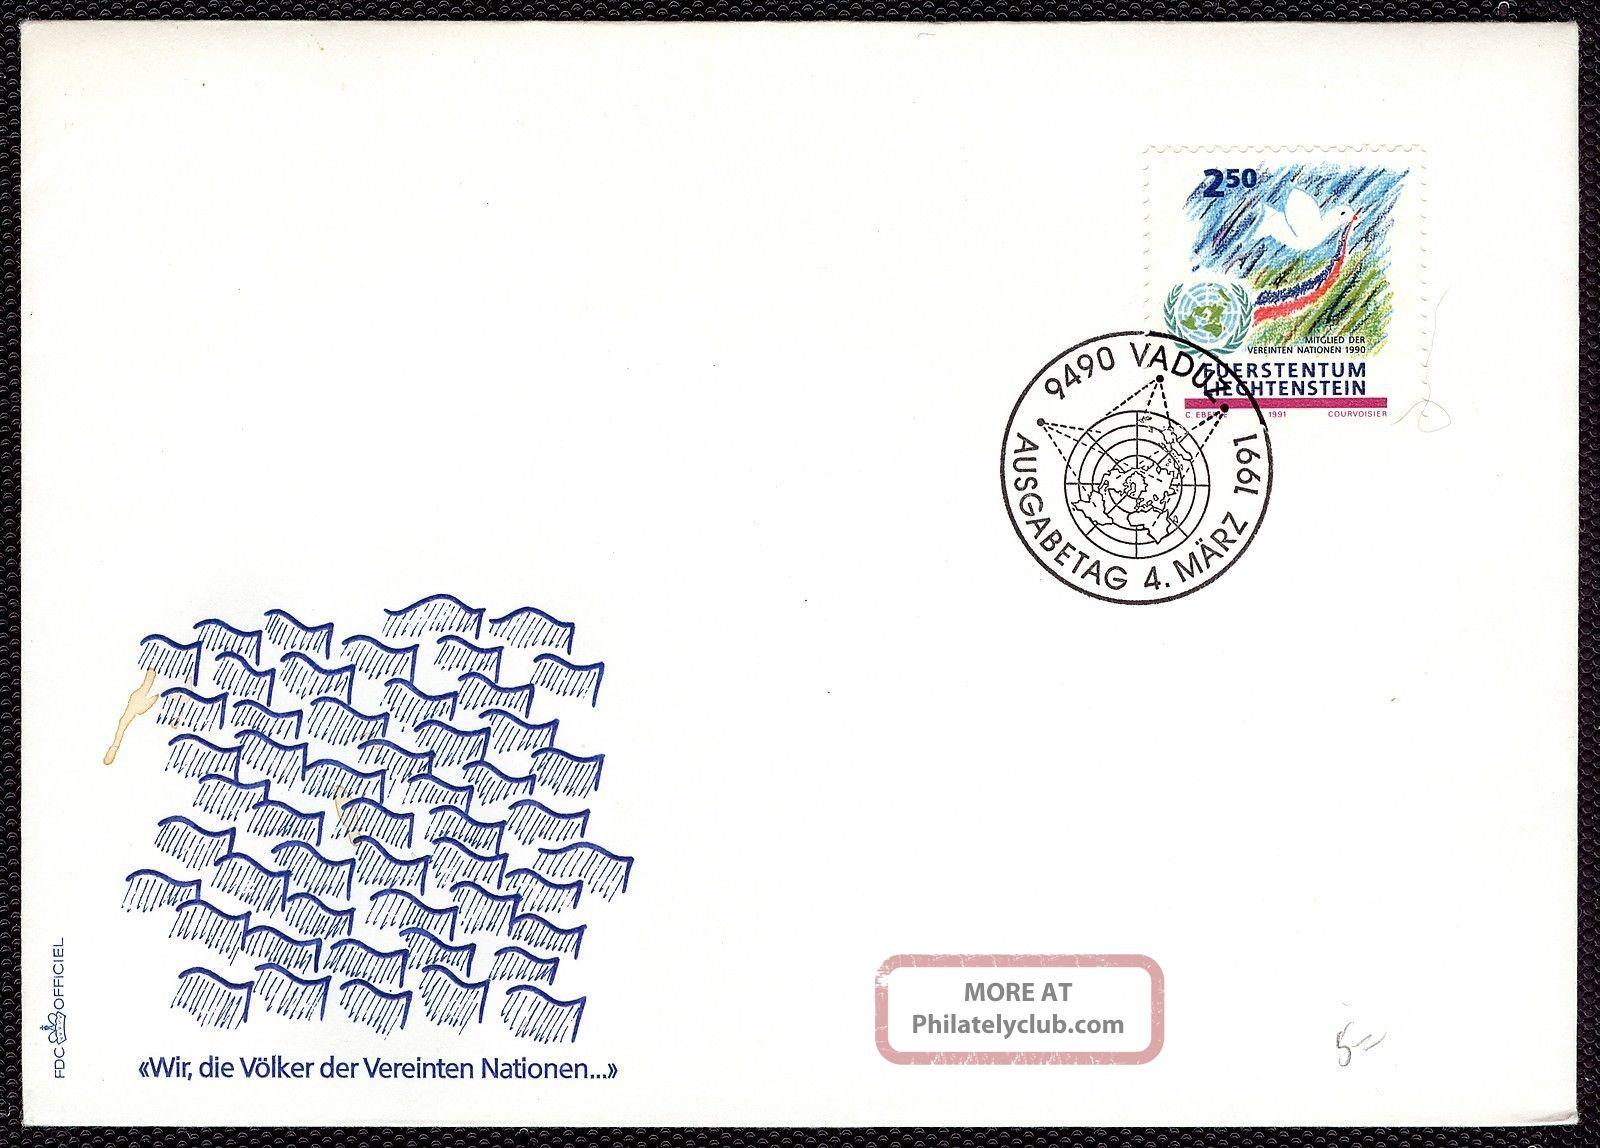 Worldwide: Liechtenstein Fdc Un Membership 1991 Commemorative Ph - 029 Worldwide photo